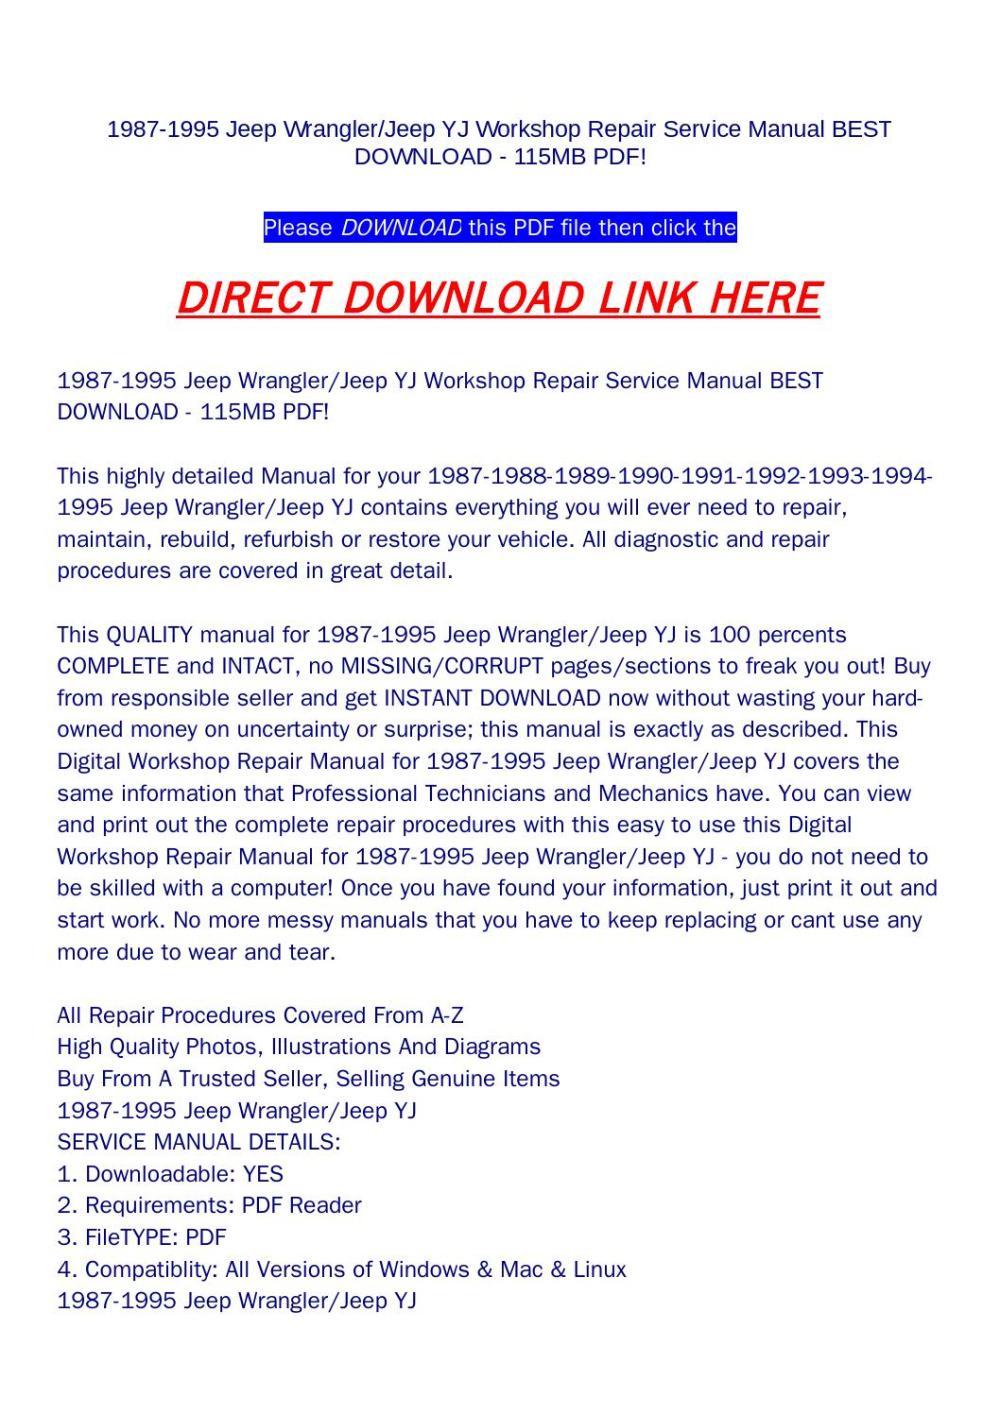 medium resolution of 1987 1995 jeep wrangler jeep yj workshop repair service manual best download 115mb pdf